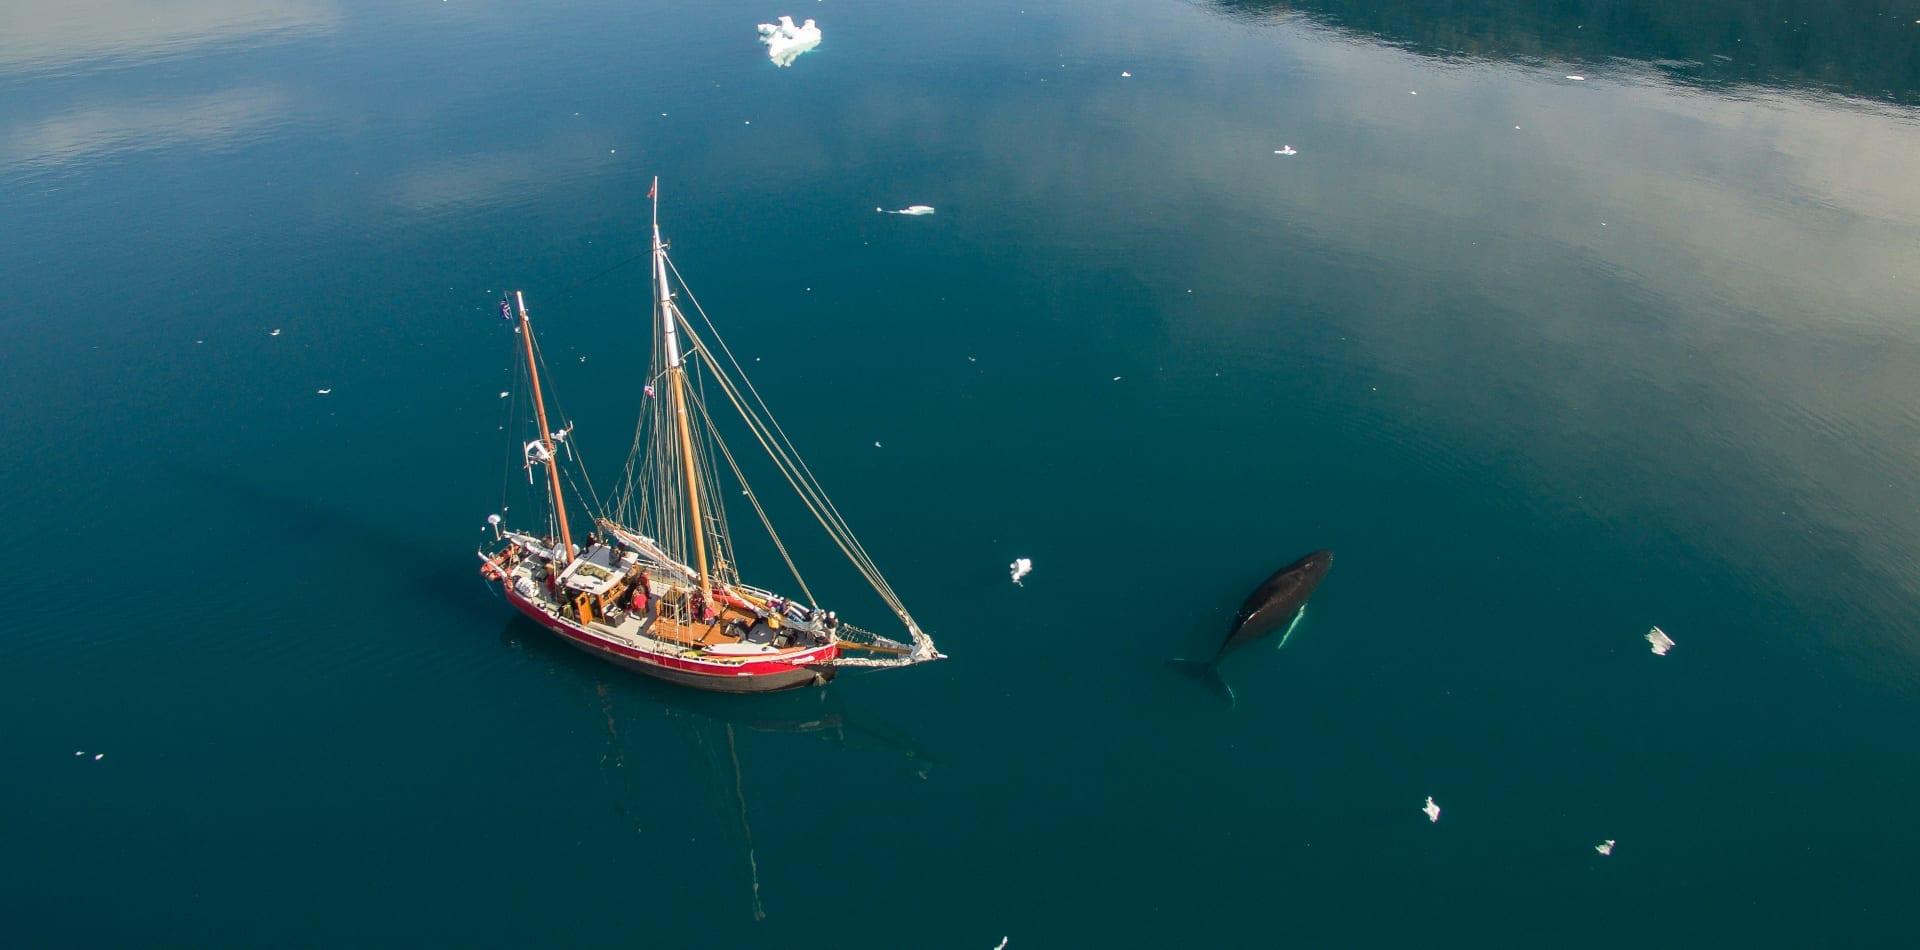 pelorus greenland yacht whale drone